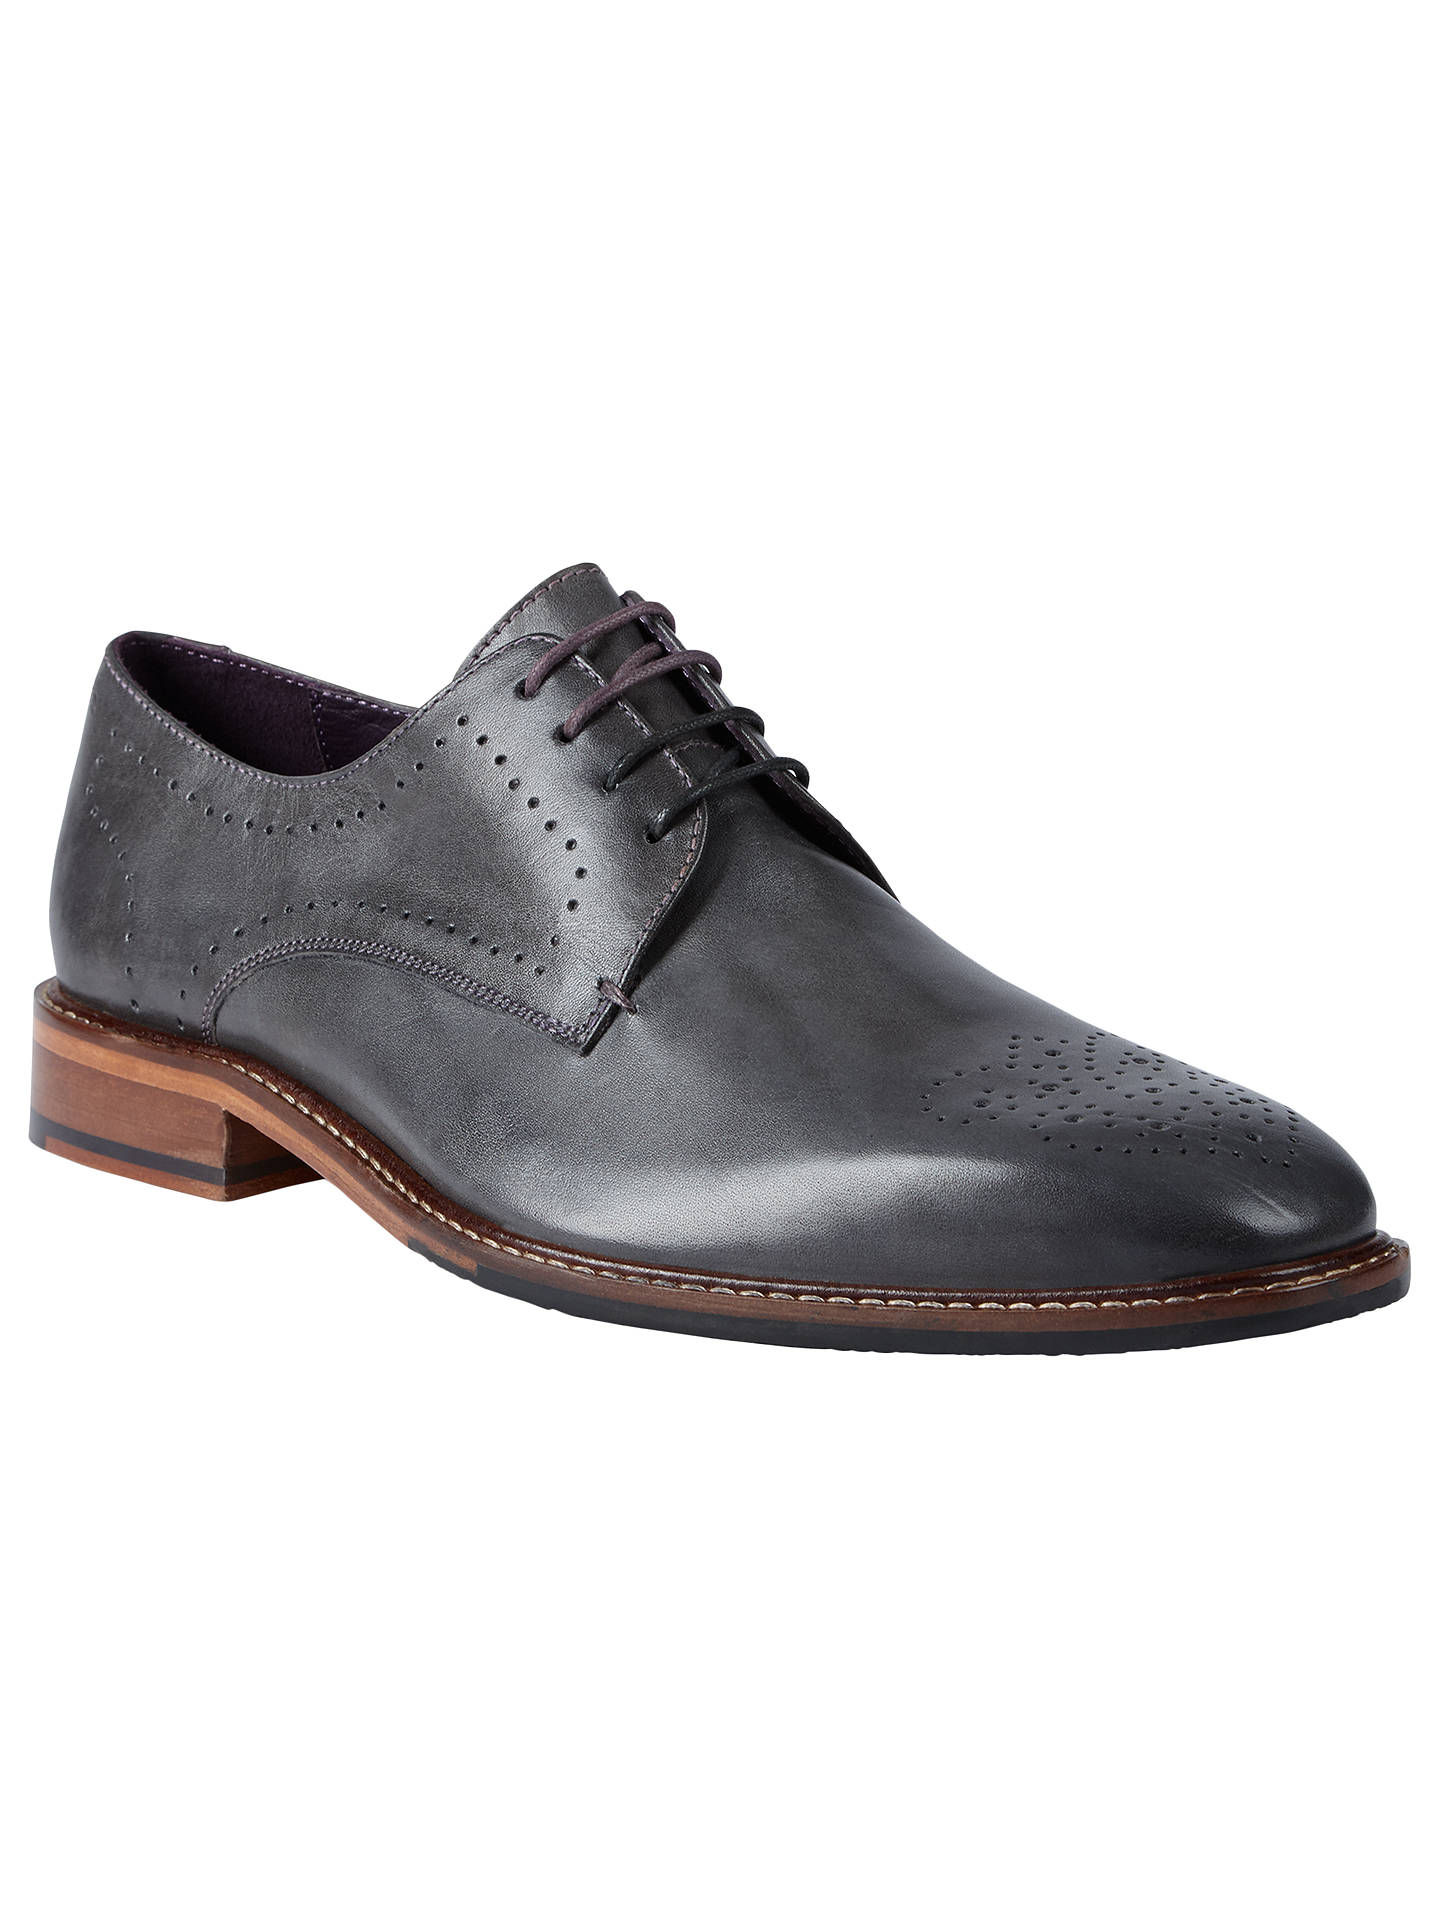 4079da21dec73e Buy Ted Baker Marar Perforated Derby Shoes